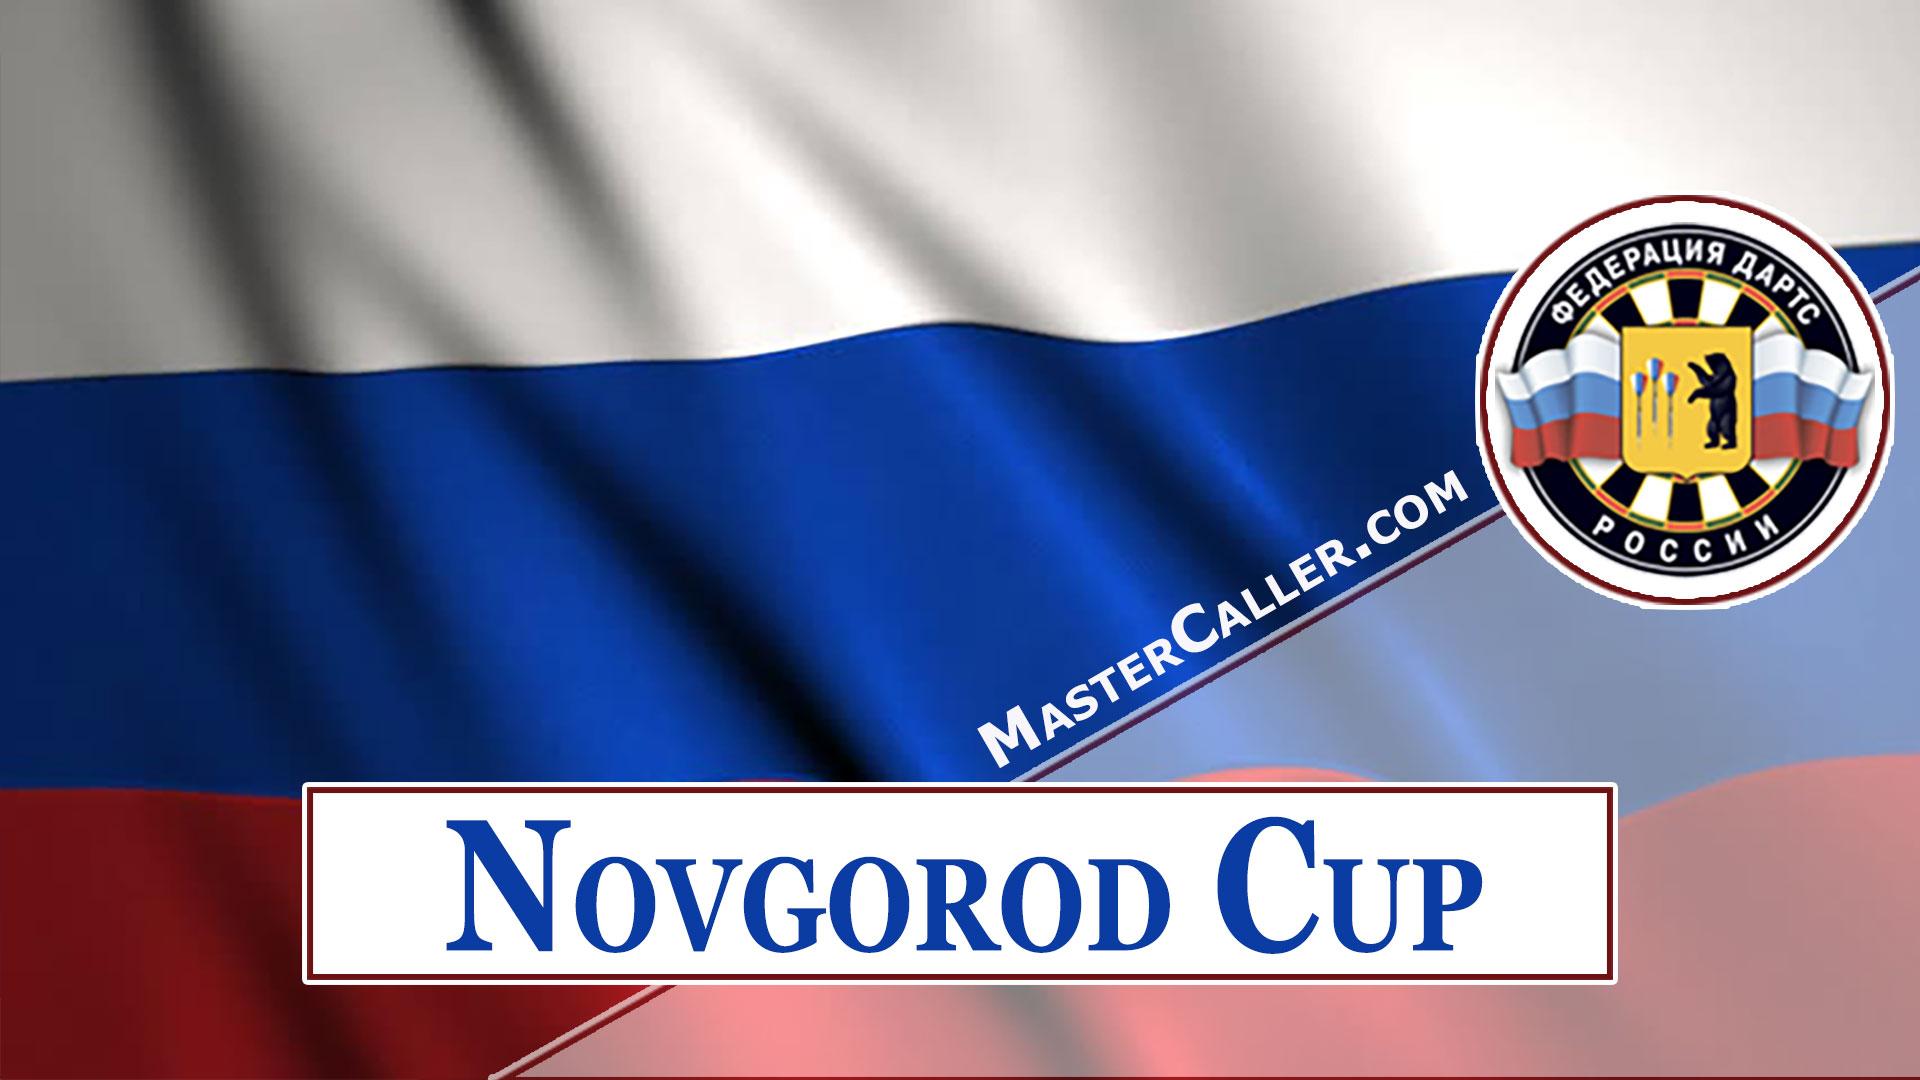 Novgorod Cup Girls - 2021 Logo